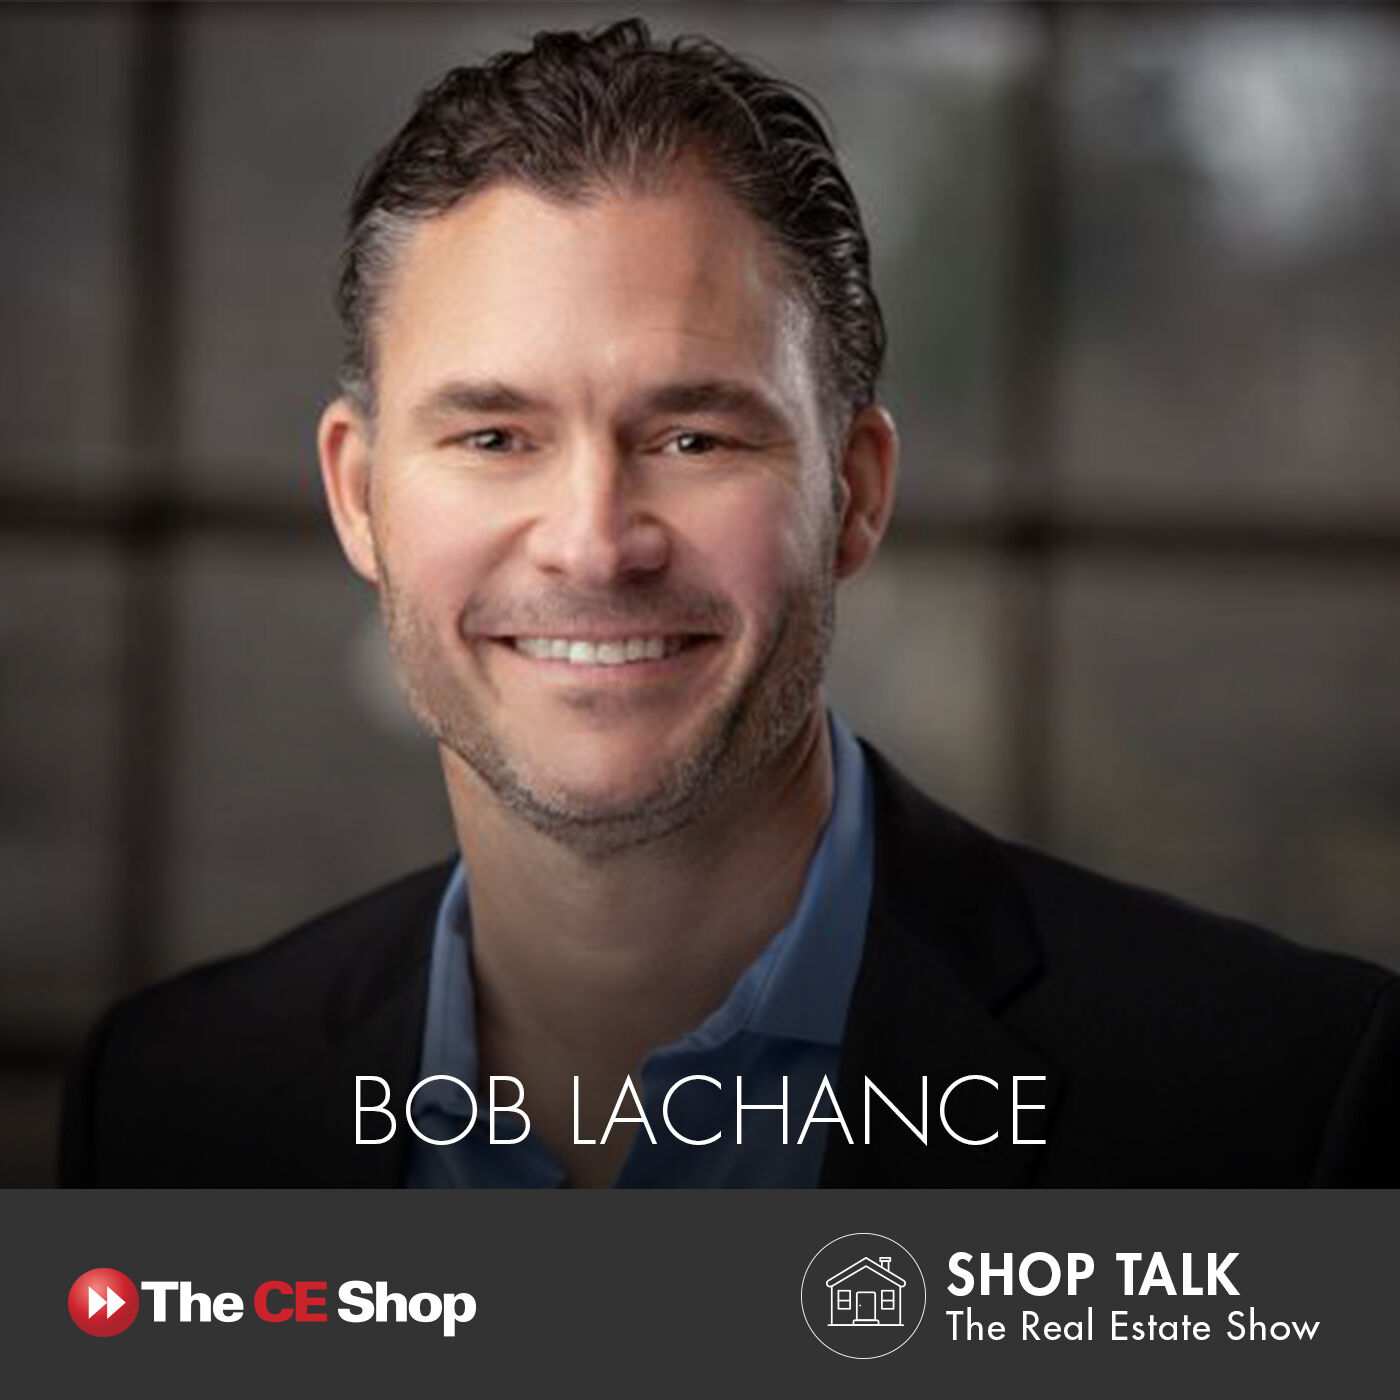 51: Bob Lachance